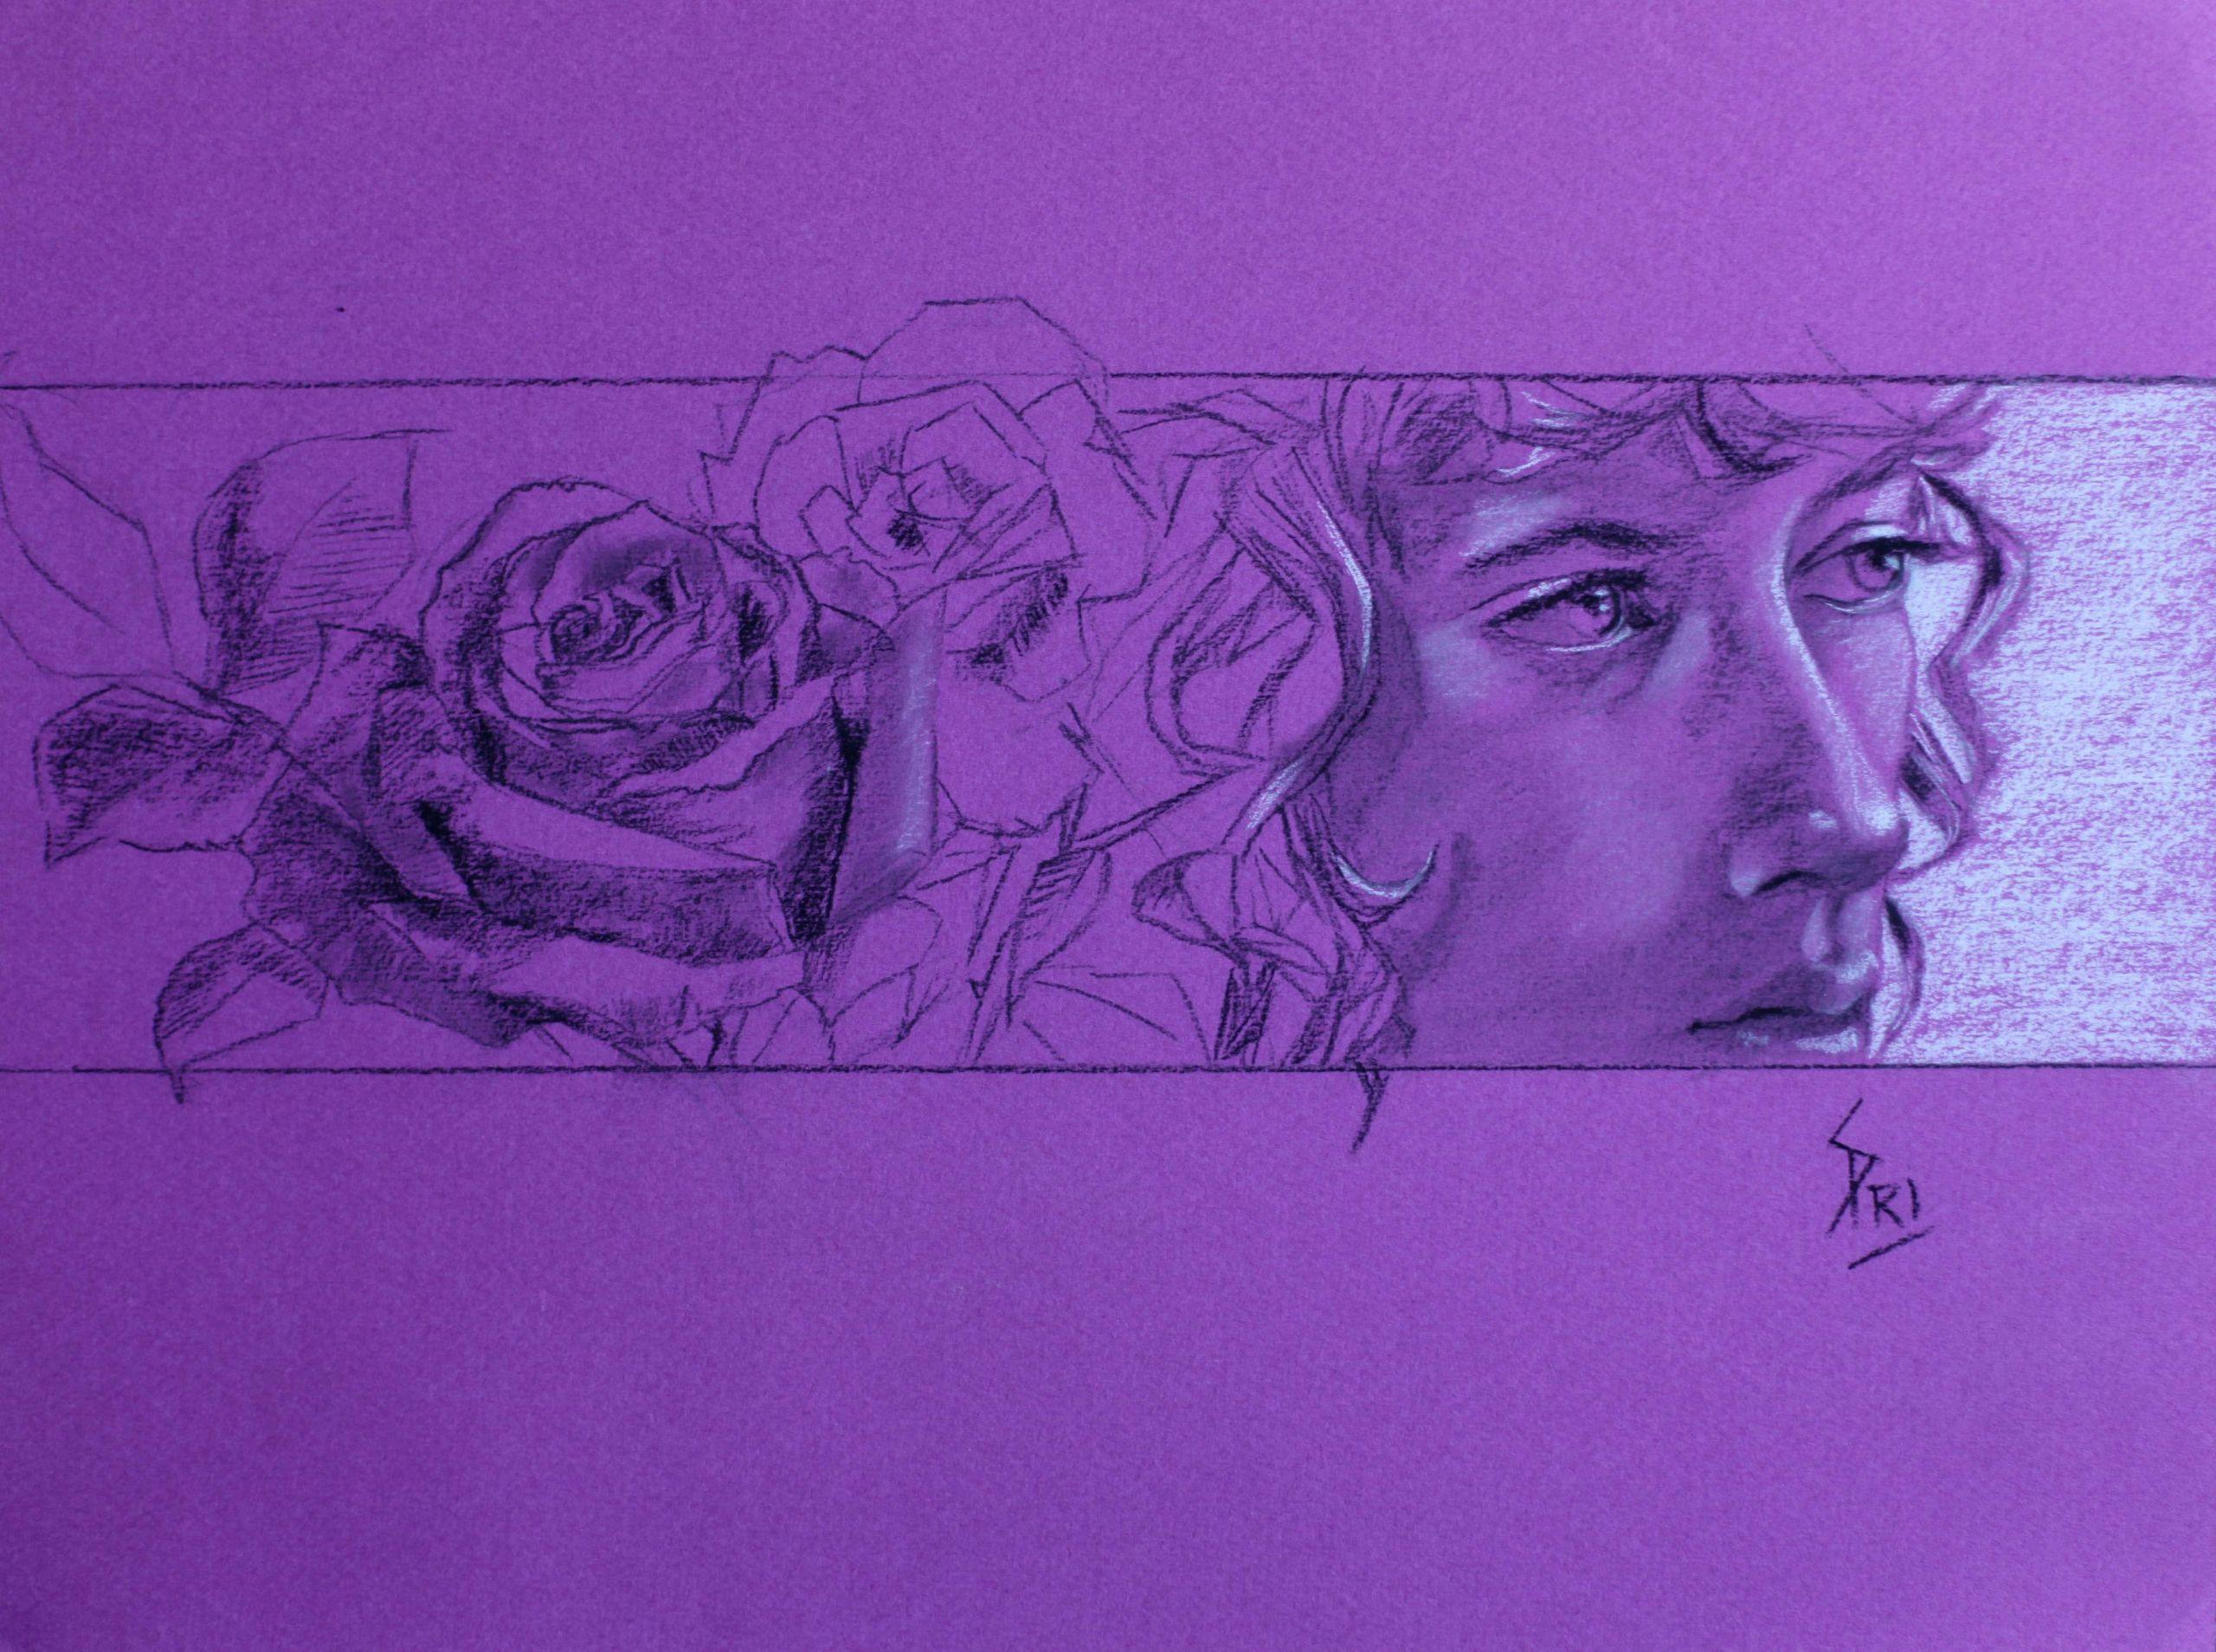 dessin 3 par Priscilla Seiller, dessinatrice